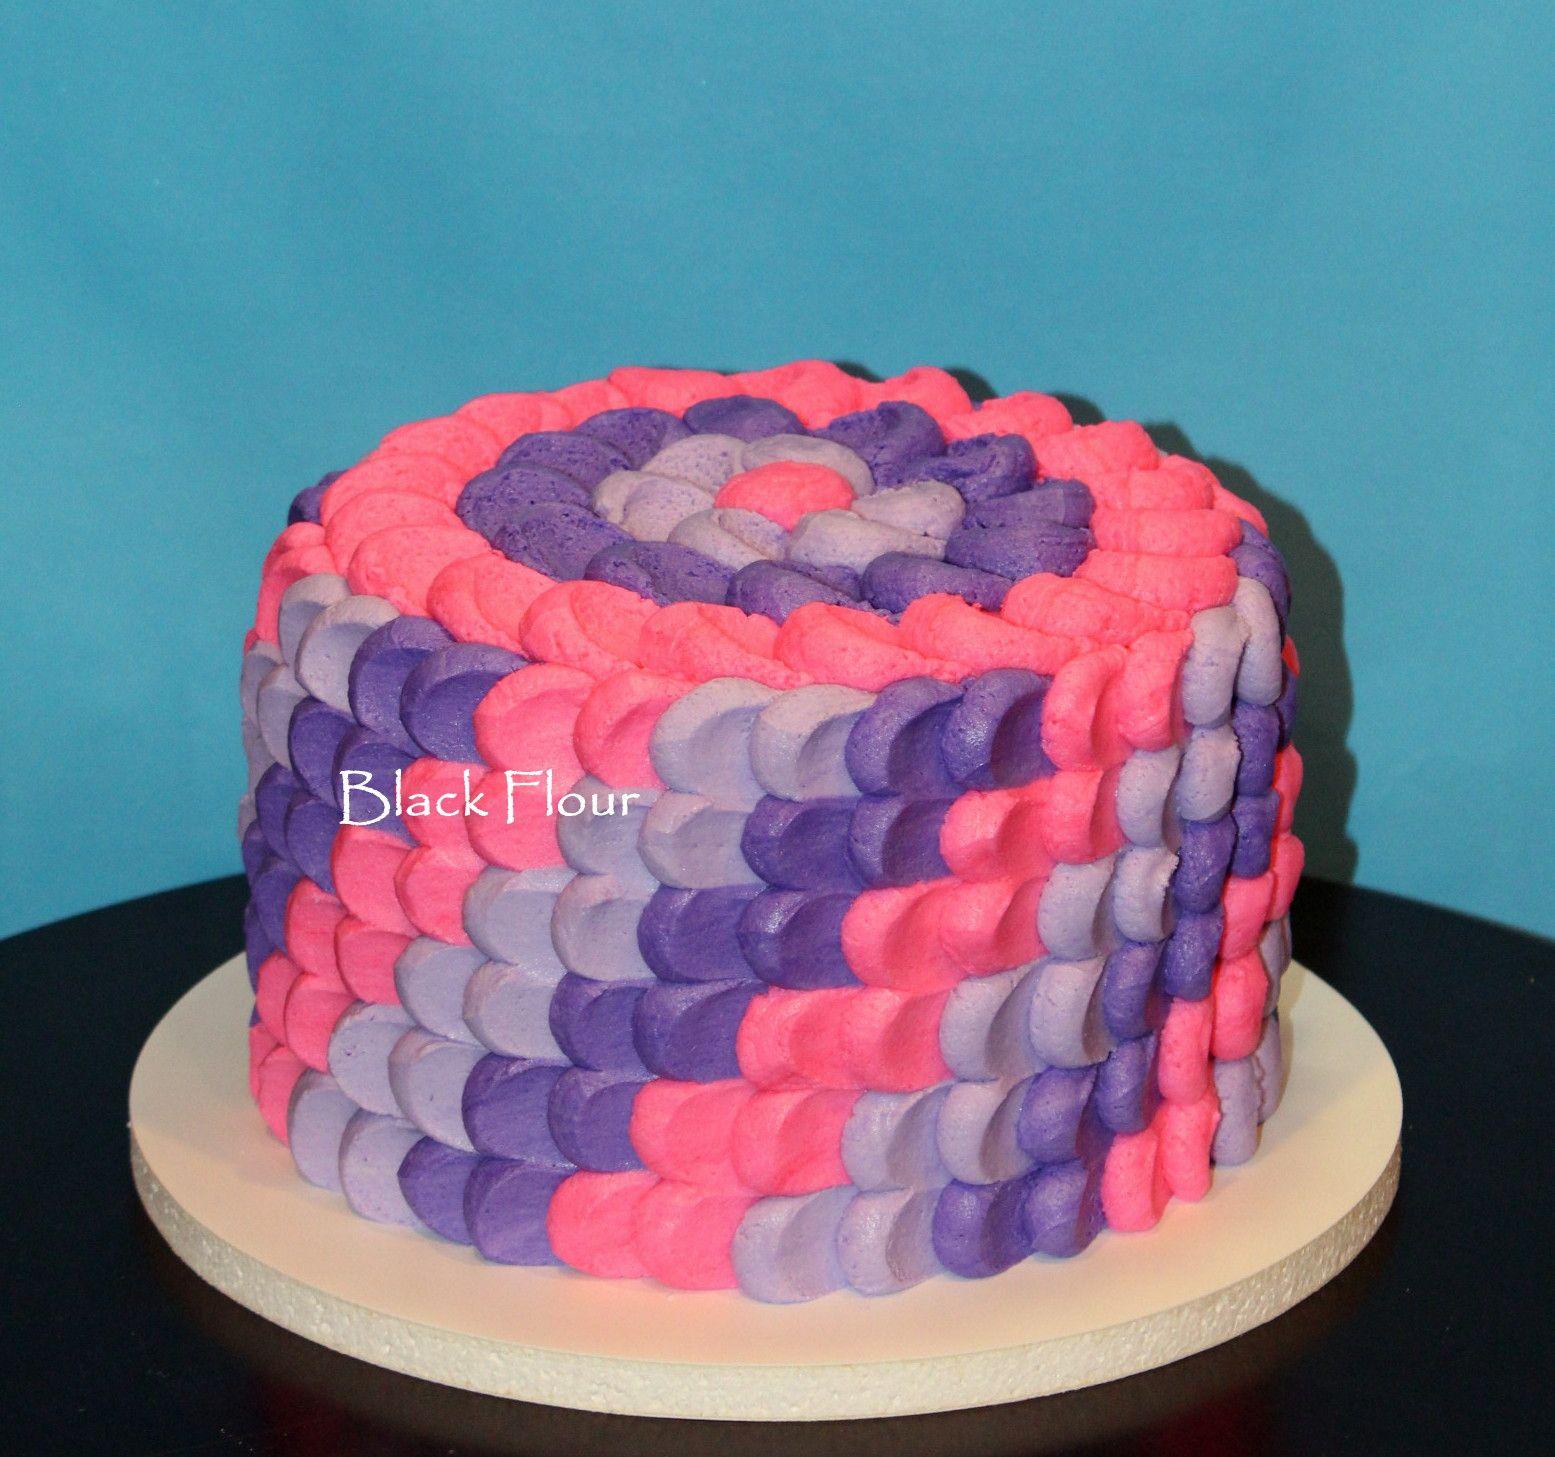 Girly Birthday Cakes www.imgkid.com - The Image Kid Has It!